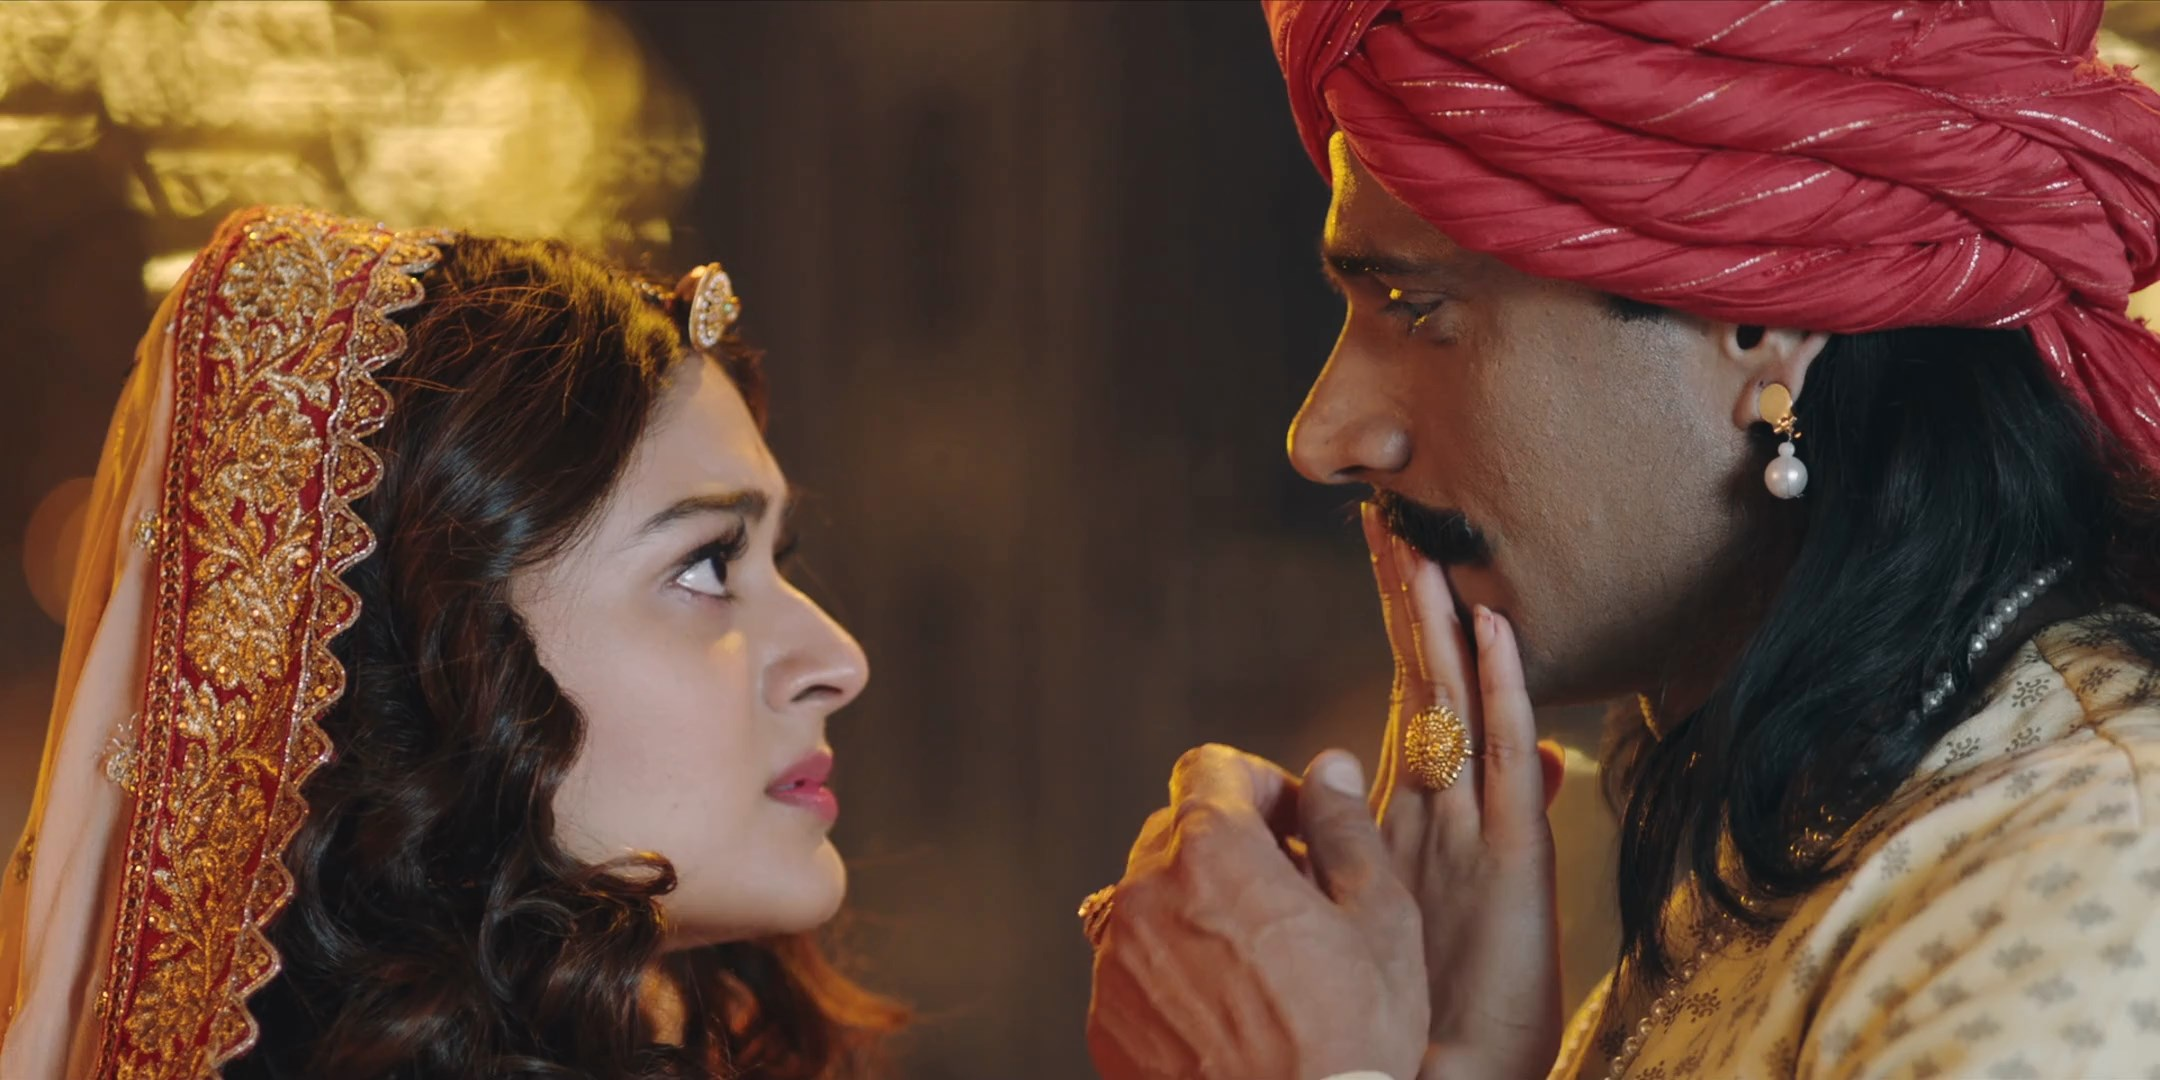 Chhatrasal (28)